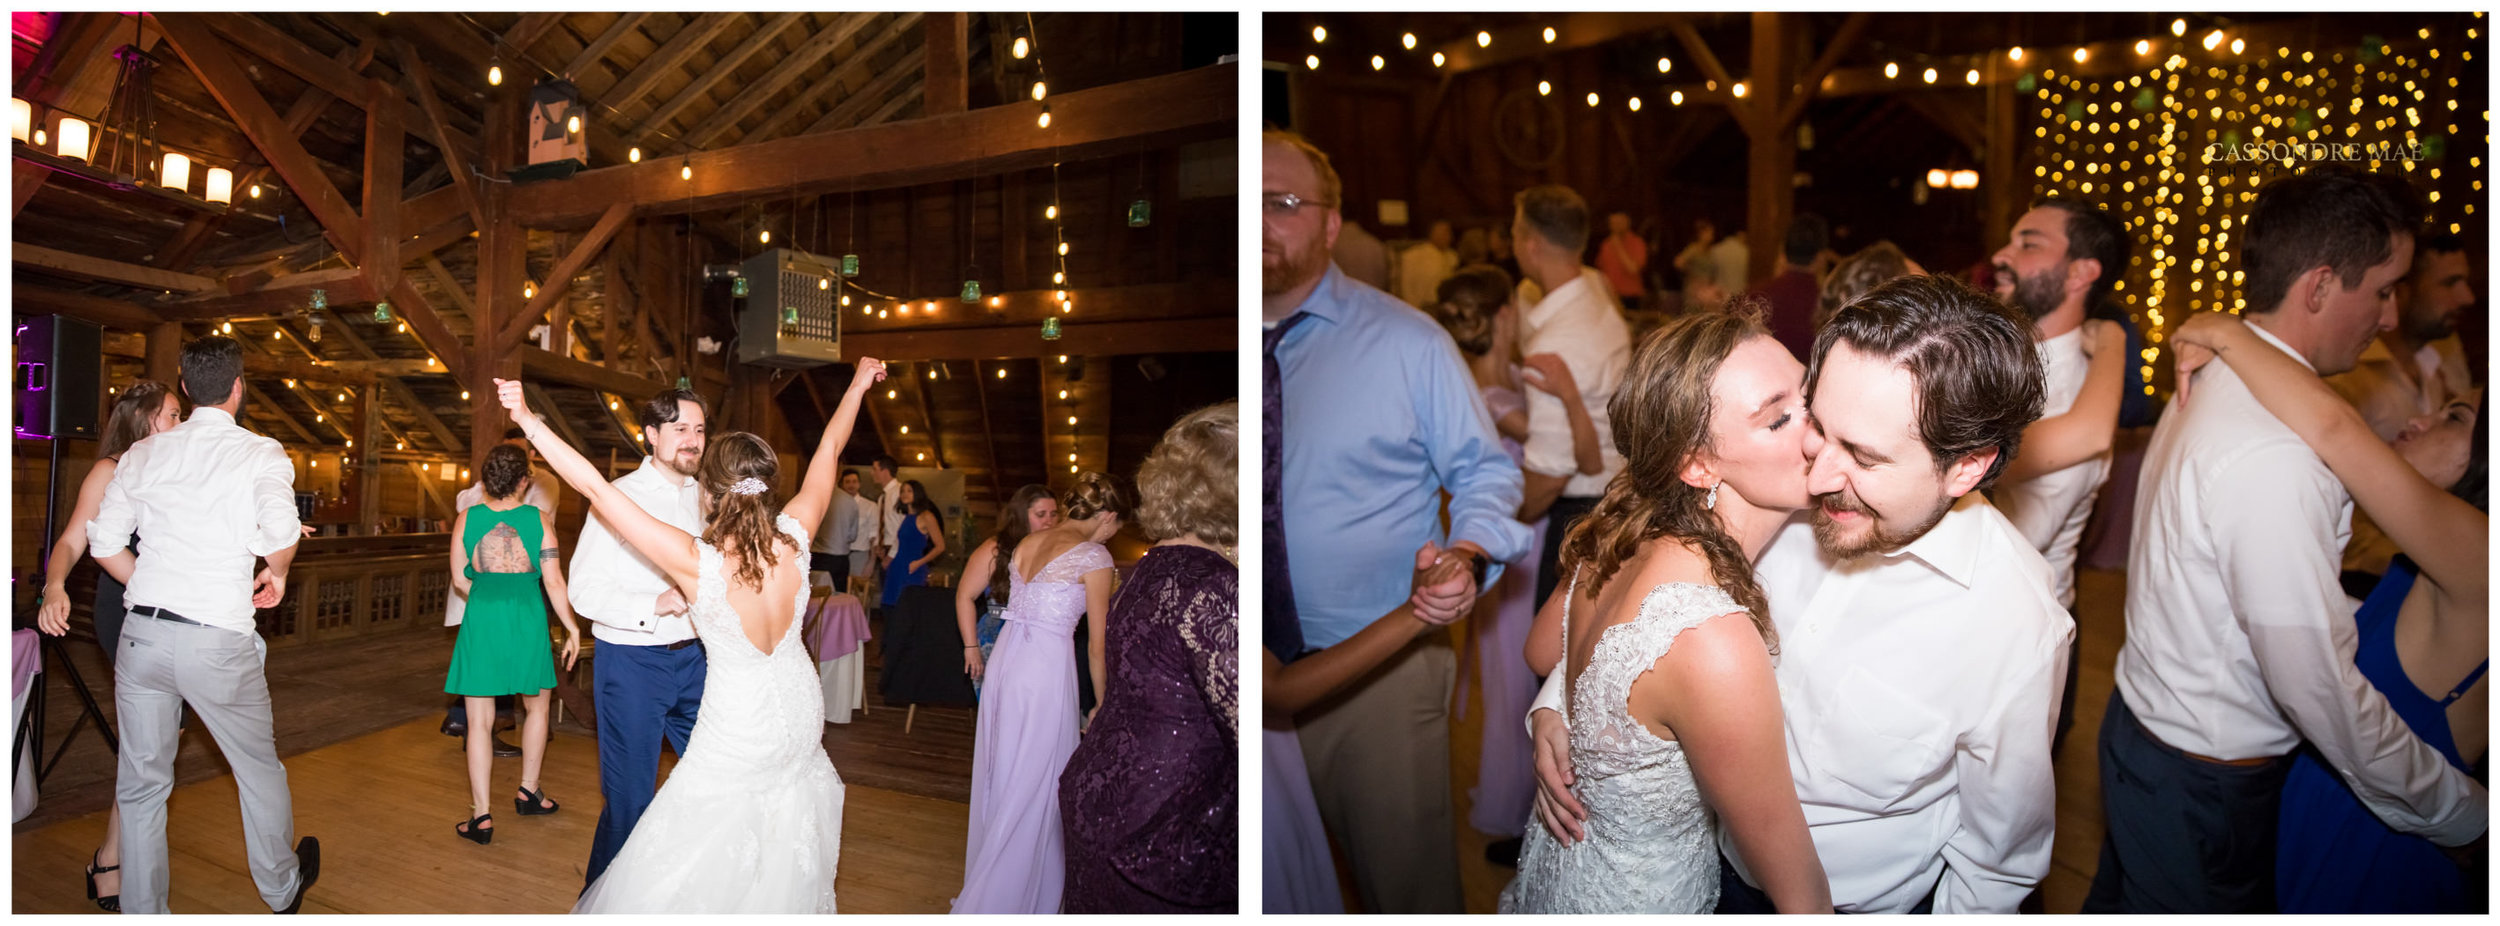 Cassondre Mae Photography hudson valley barn weddings -24.jpg